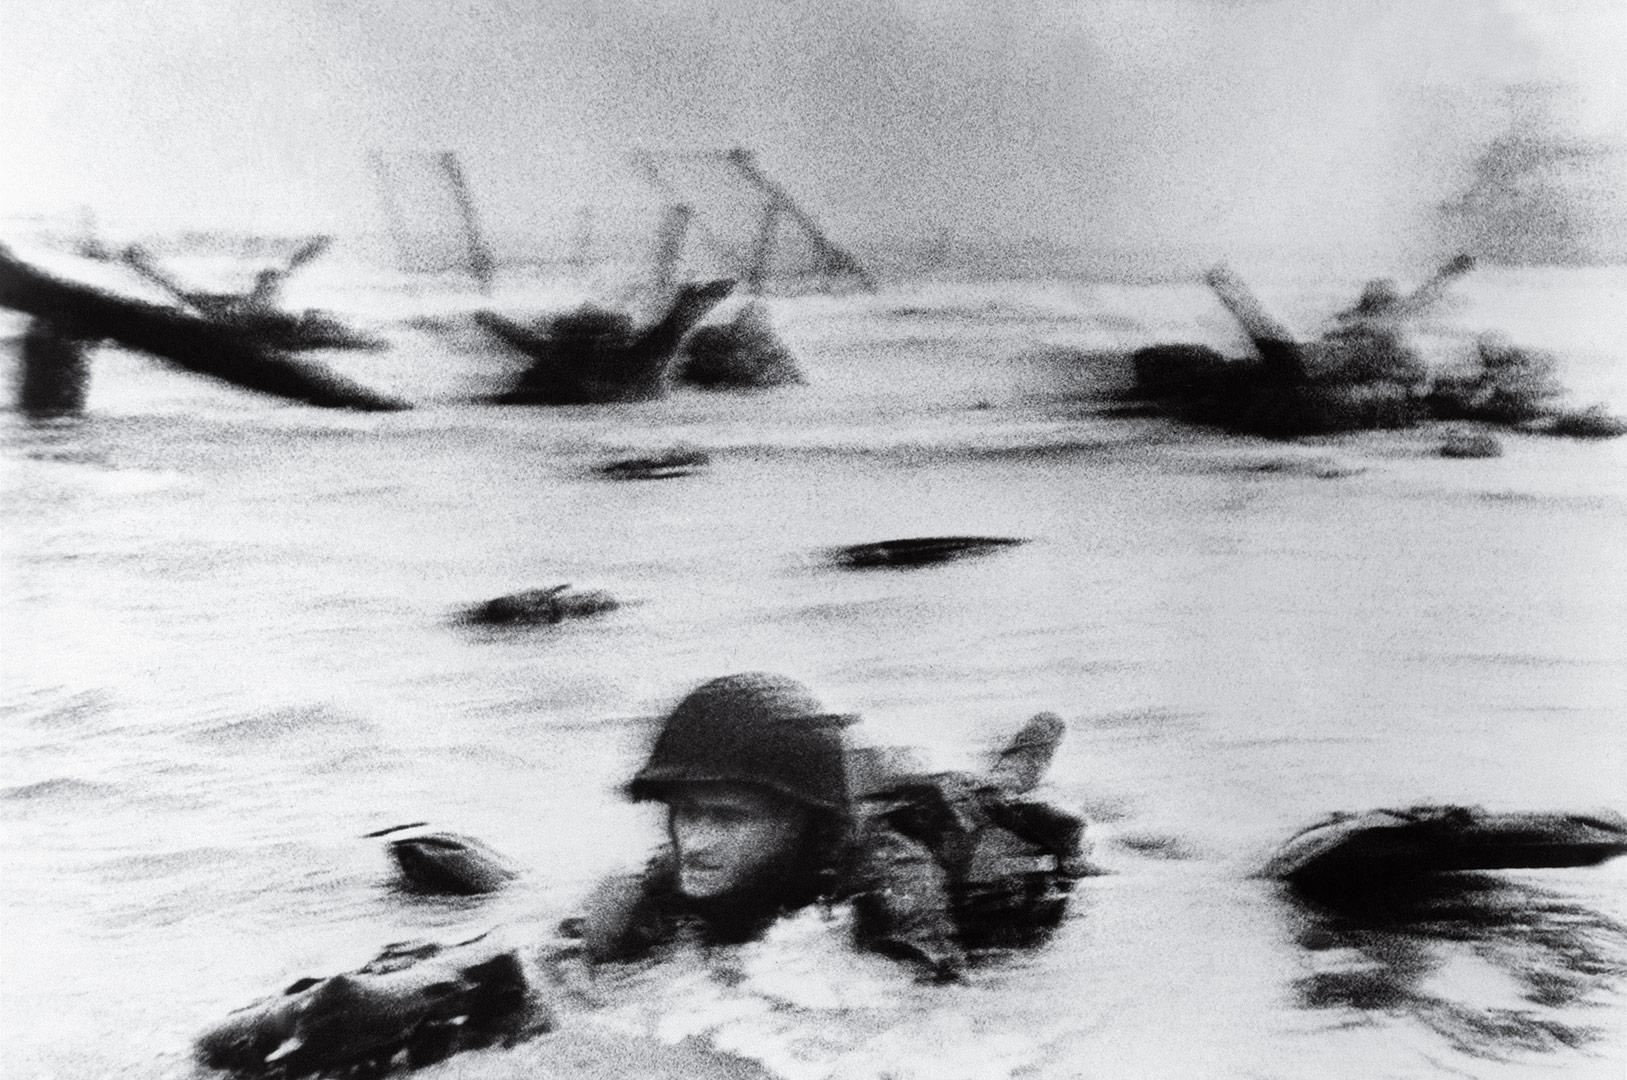 time-100-influential-photos-robert-capa-d-day-34.jpg